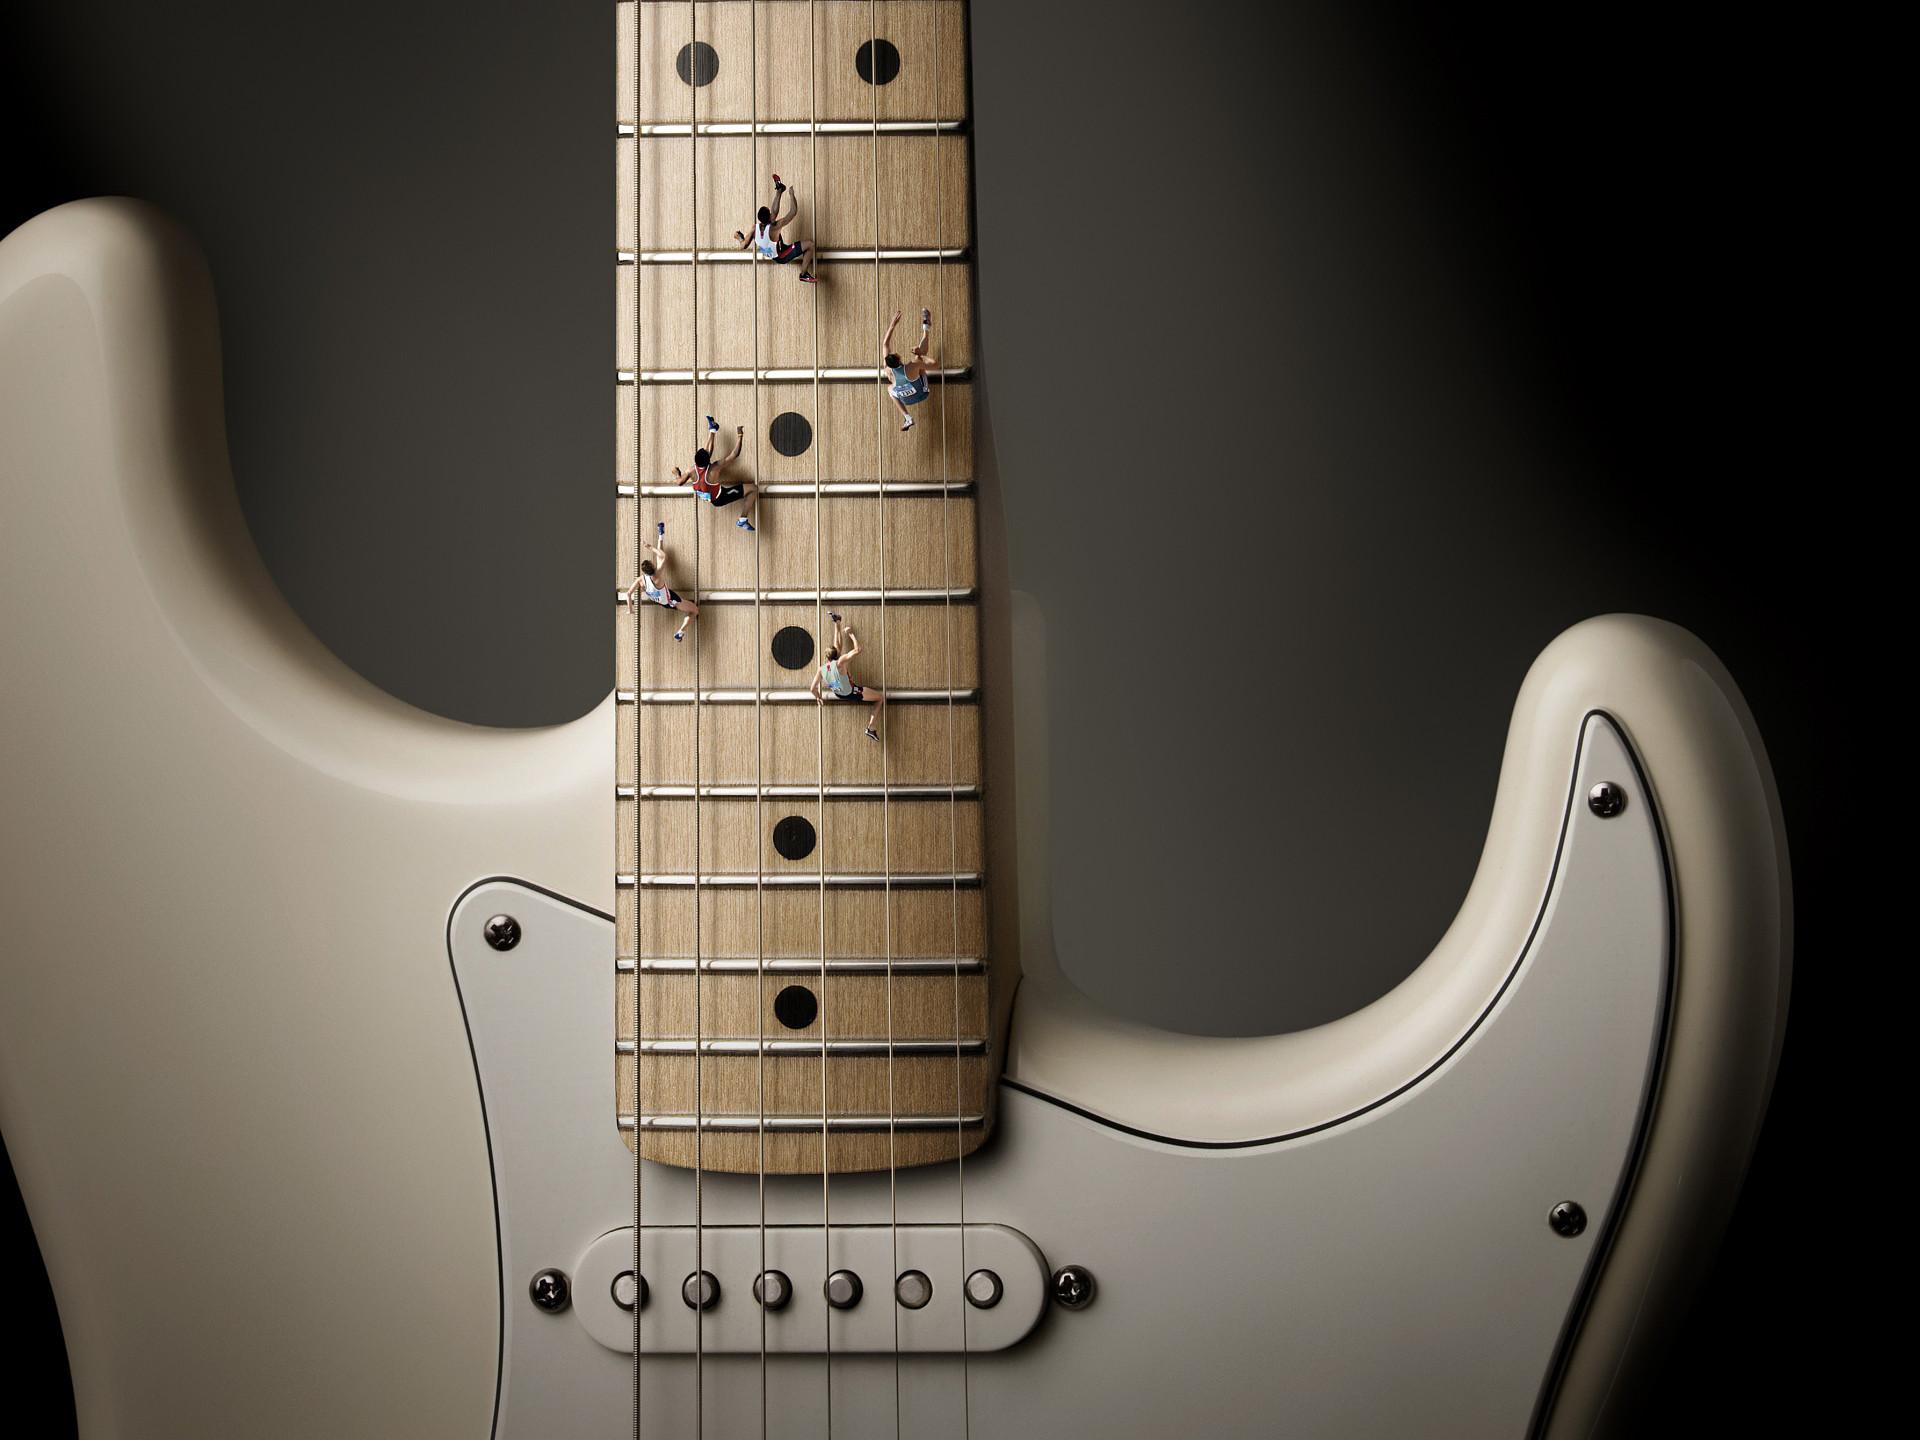 1920x1080 wallpaper.wiki-Fender-Photos-Download-PIC-WPB005248